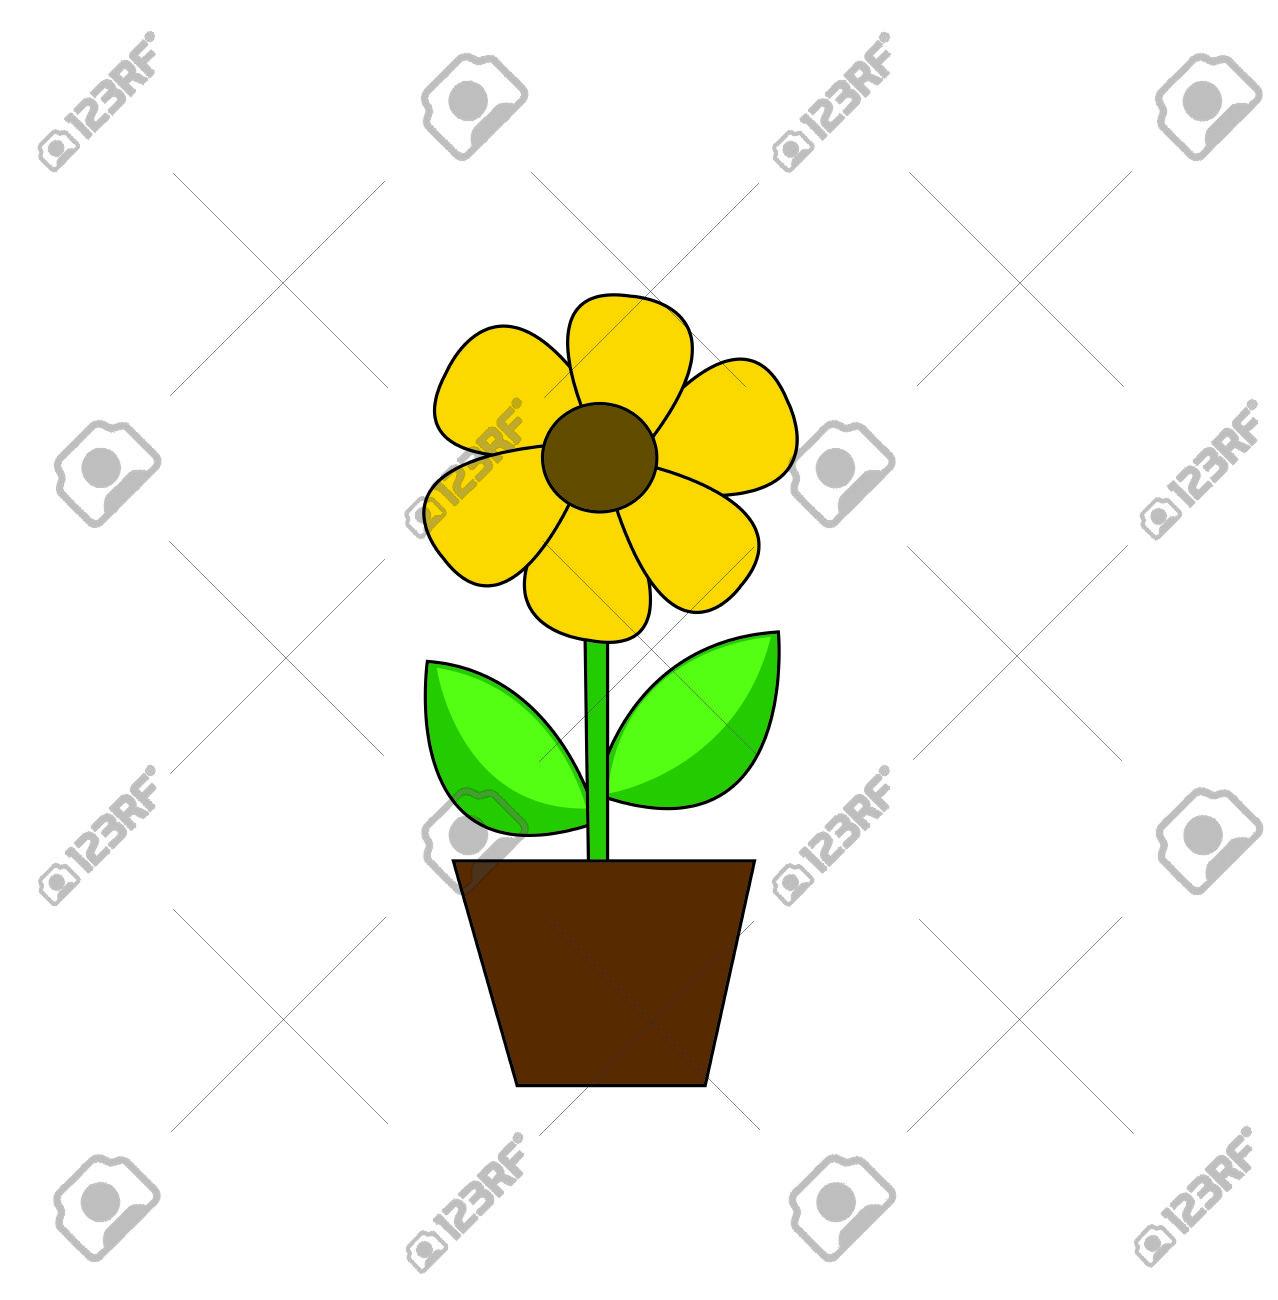 Sunflower Flower Pedicle Nature Illustration Yellow Summer Bright.